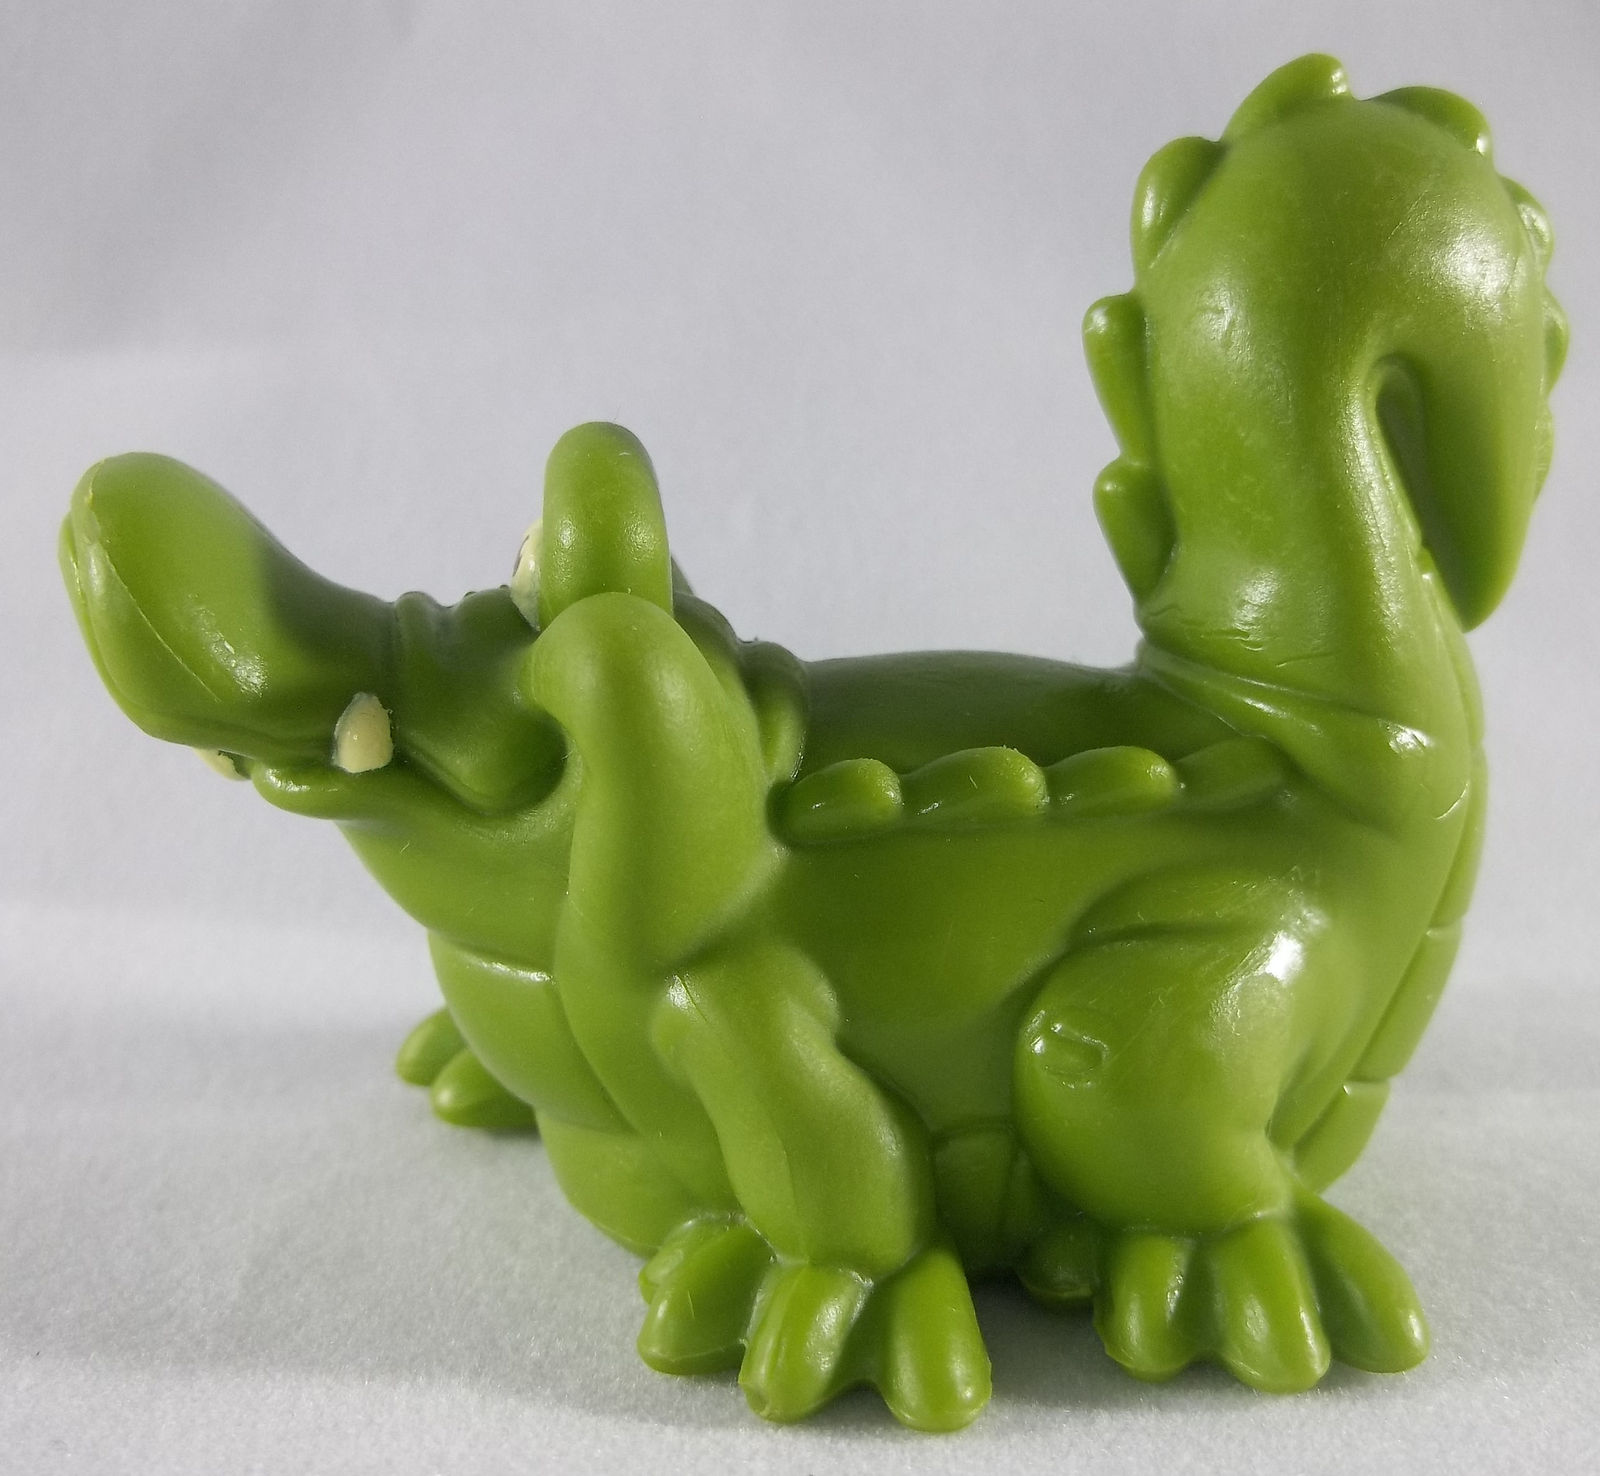 Disney Jake and the Never Land Pirates Croc figure Tick-Tock the Crocodile 1:66